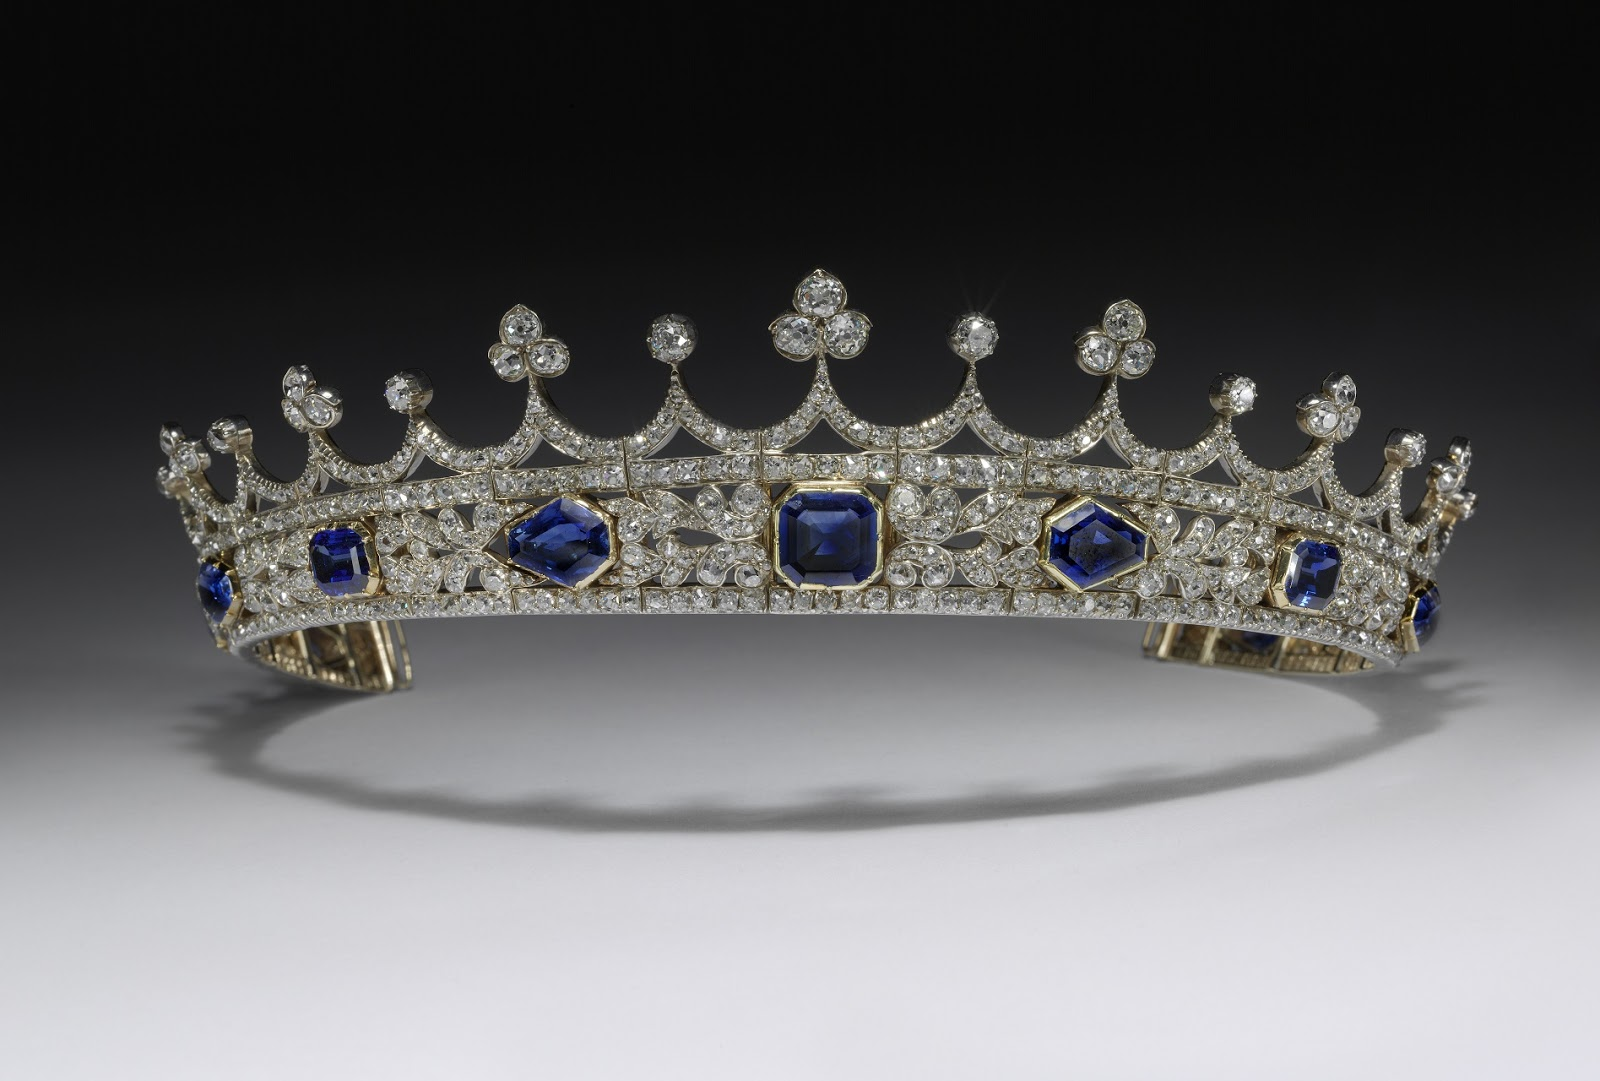 Jewelry News Network